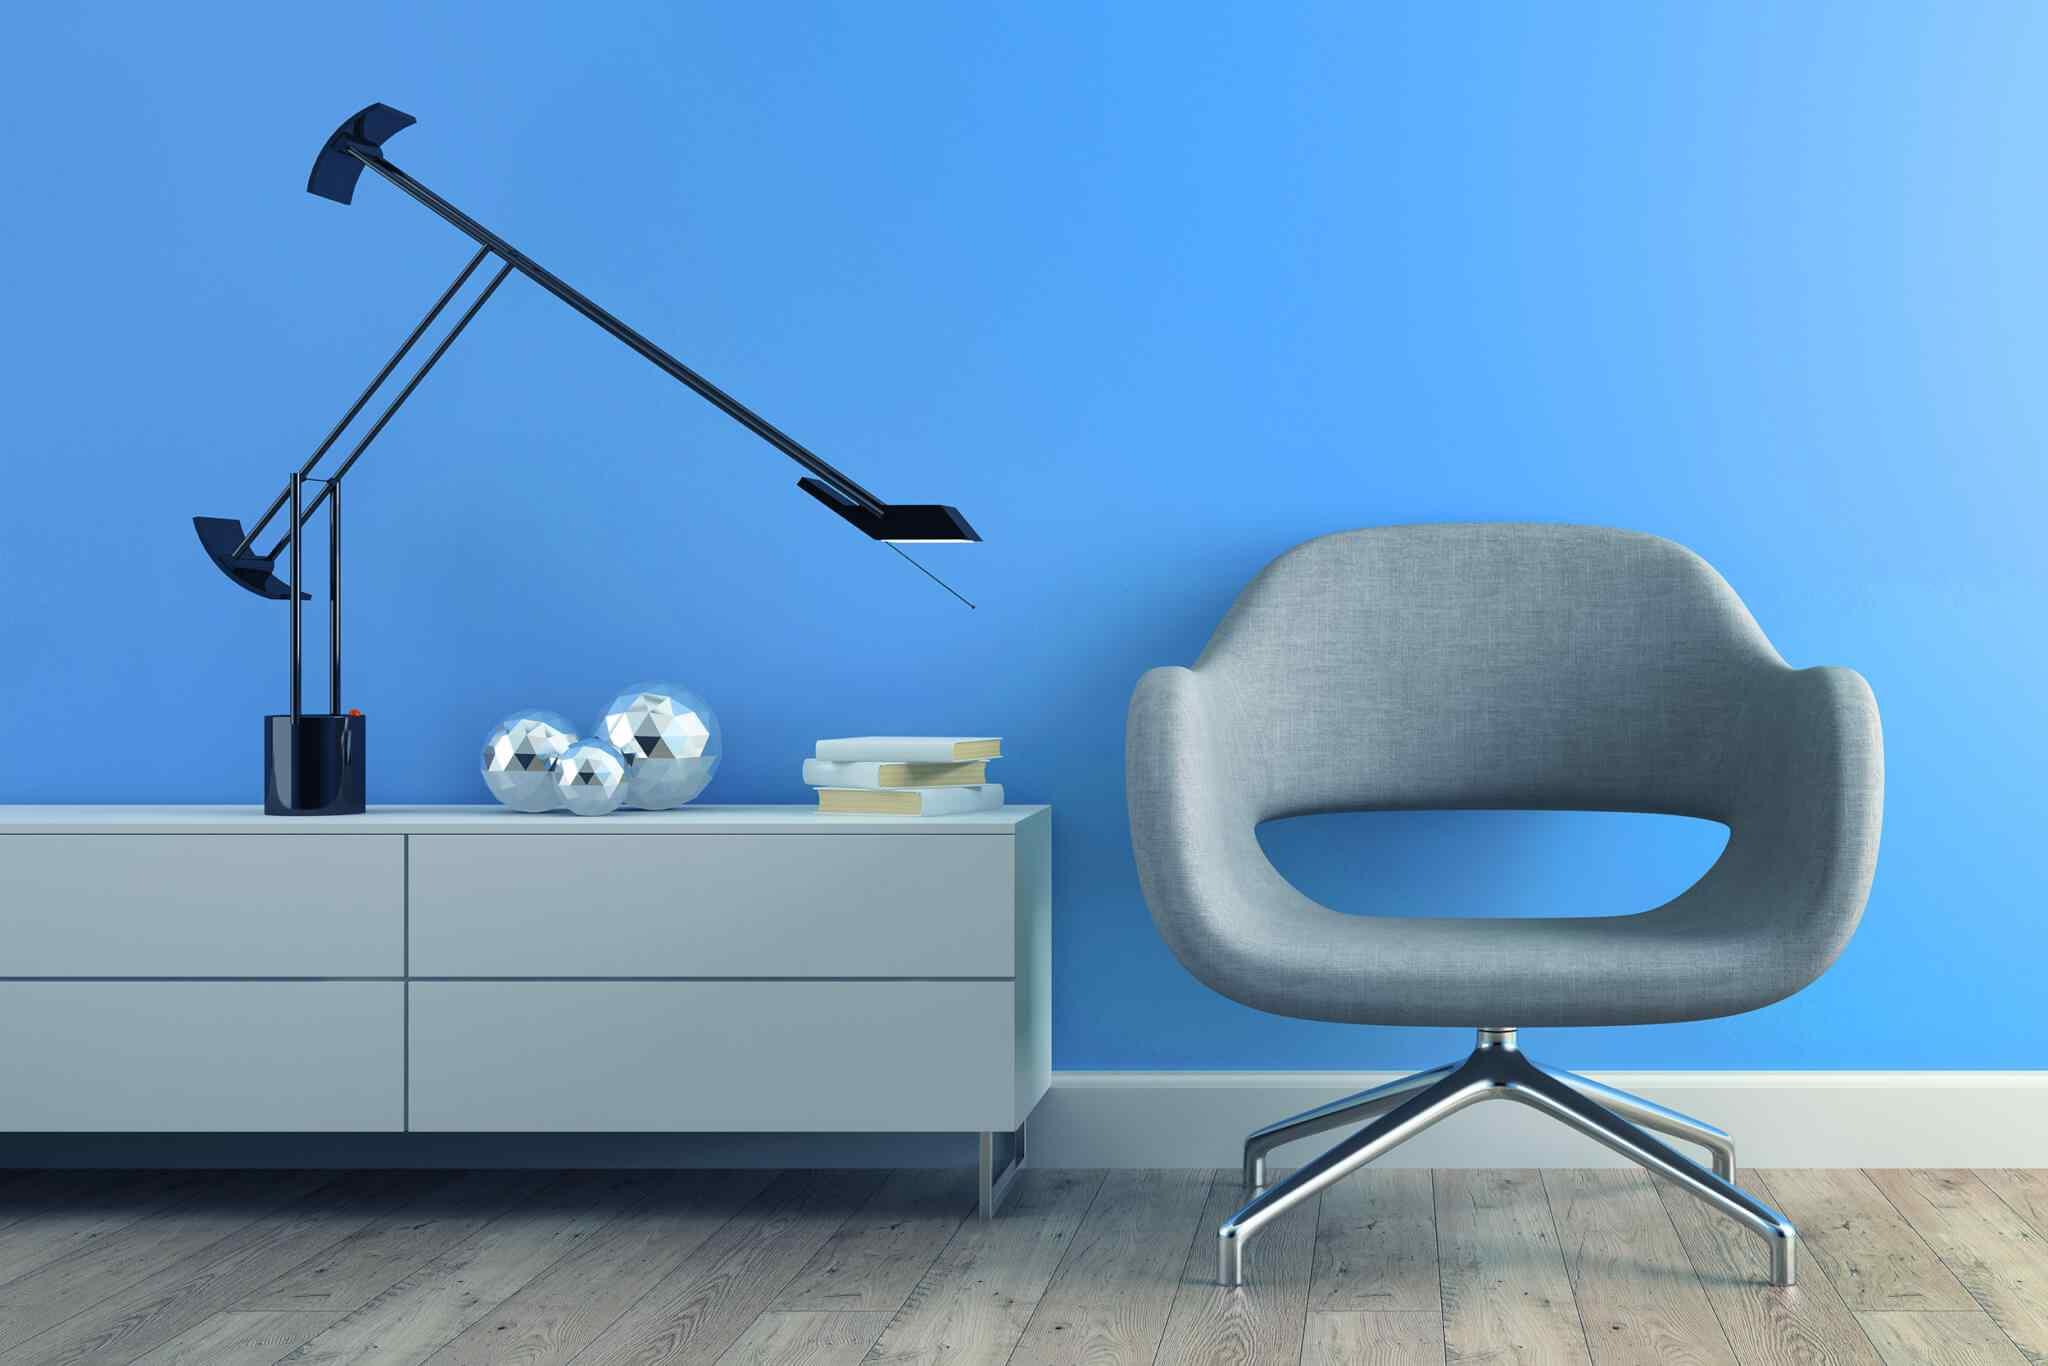 https://wudbell.com/wp-content/uploads/2020/08/image-chair-blue-wall.jpg